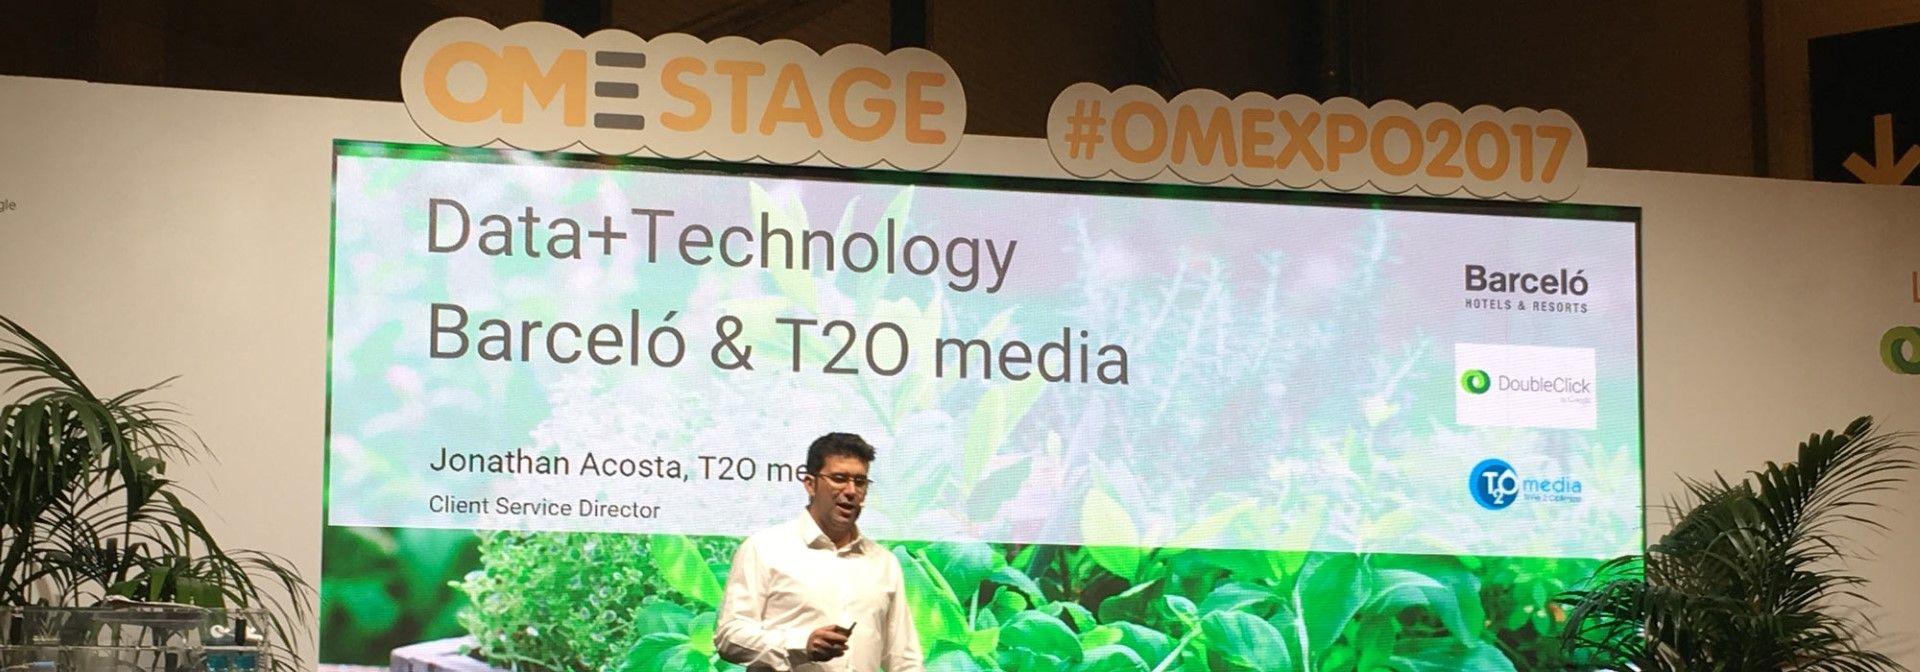 OMEstage, Caso de éxito en OMExpo 2017